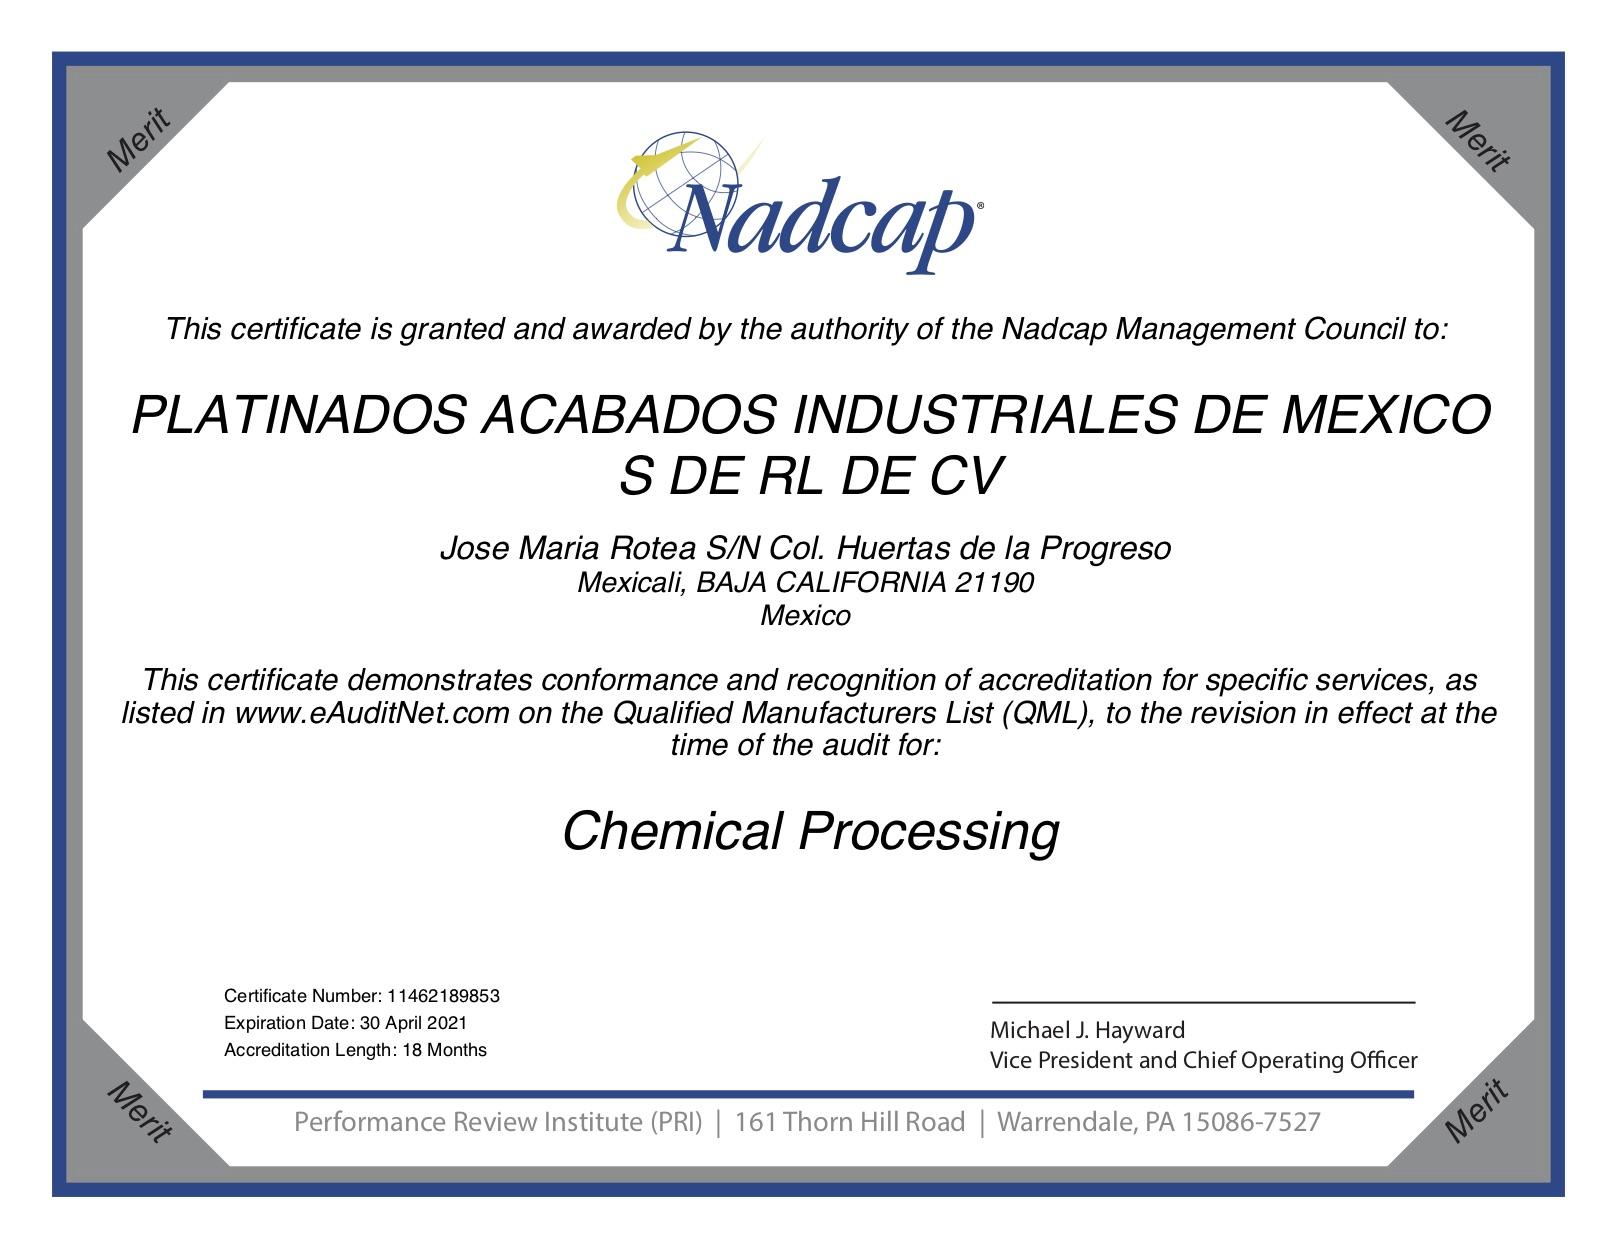 NADCAP Chemical Processing Expiration date, 30 April 2021